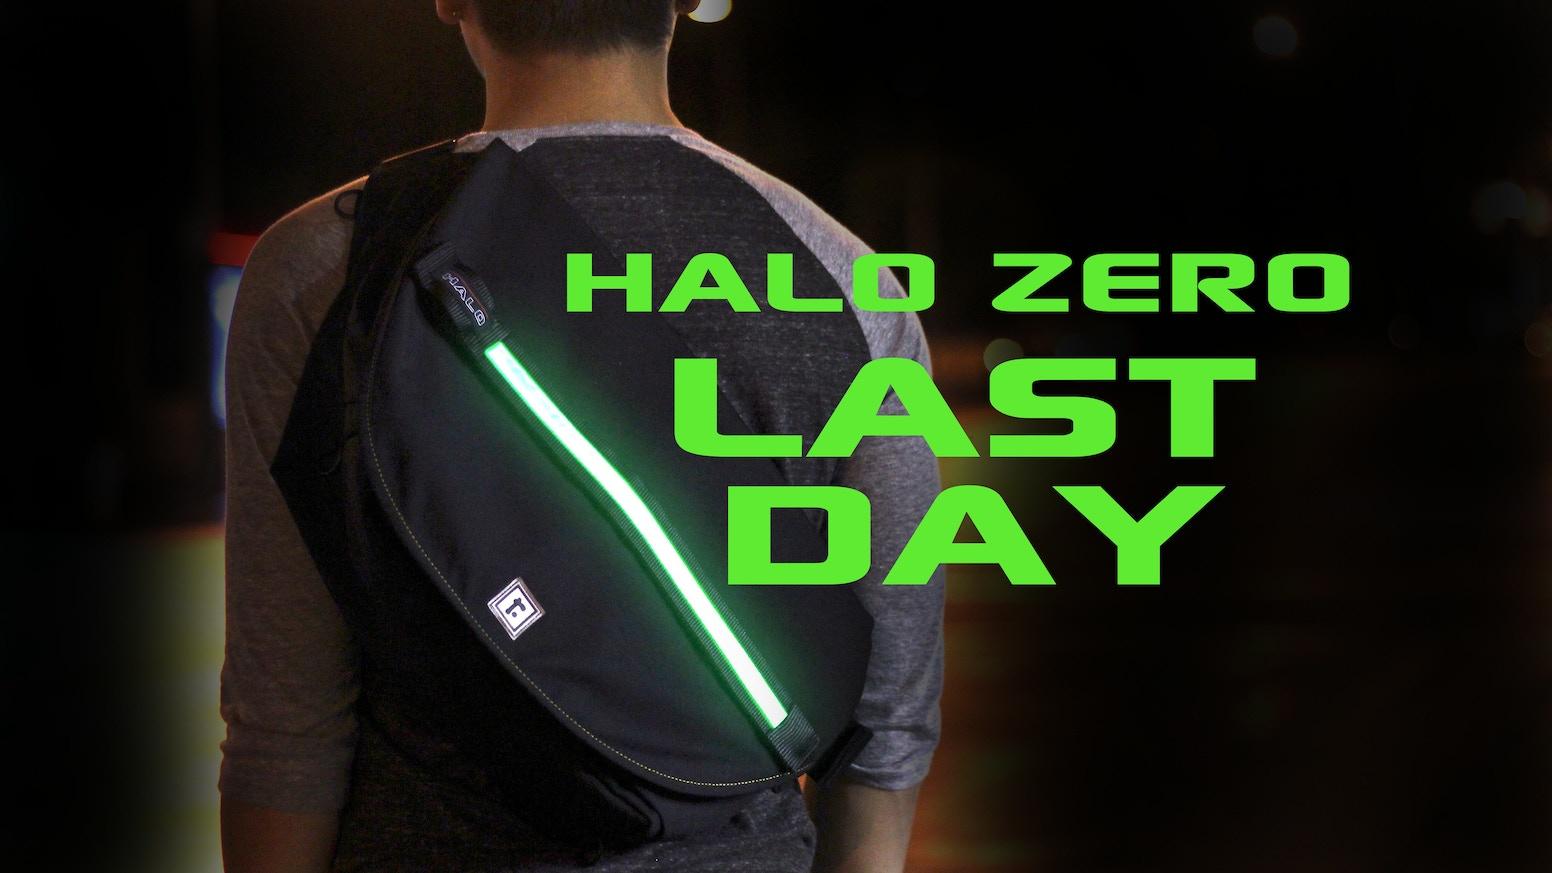 Mission: SAVE LIVES.HALO ZERO messenger bag illuminates at night, keeping safety just a click away.